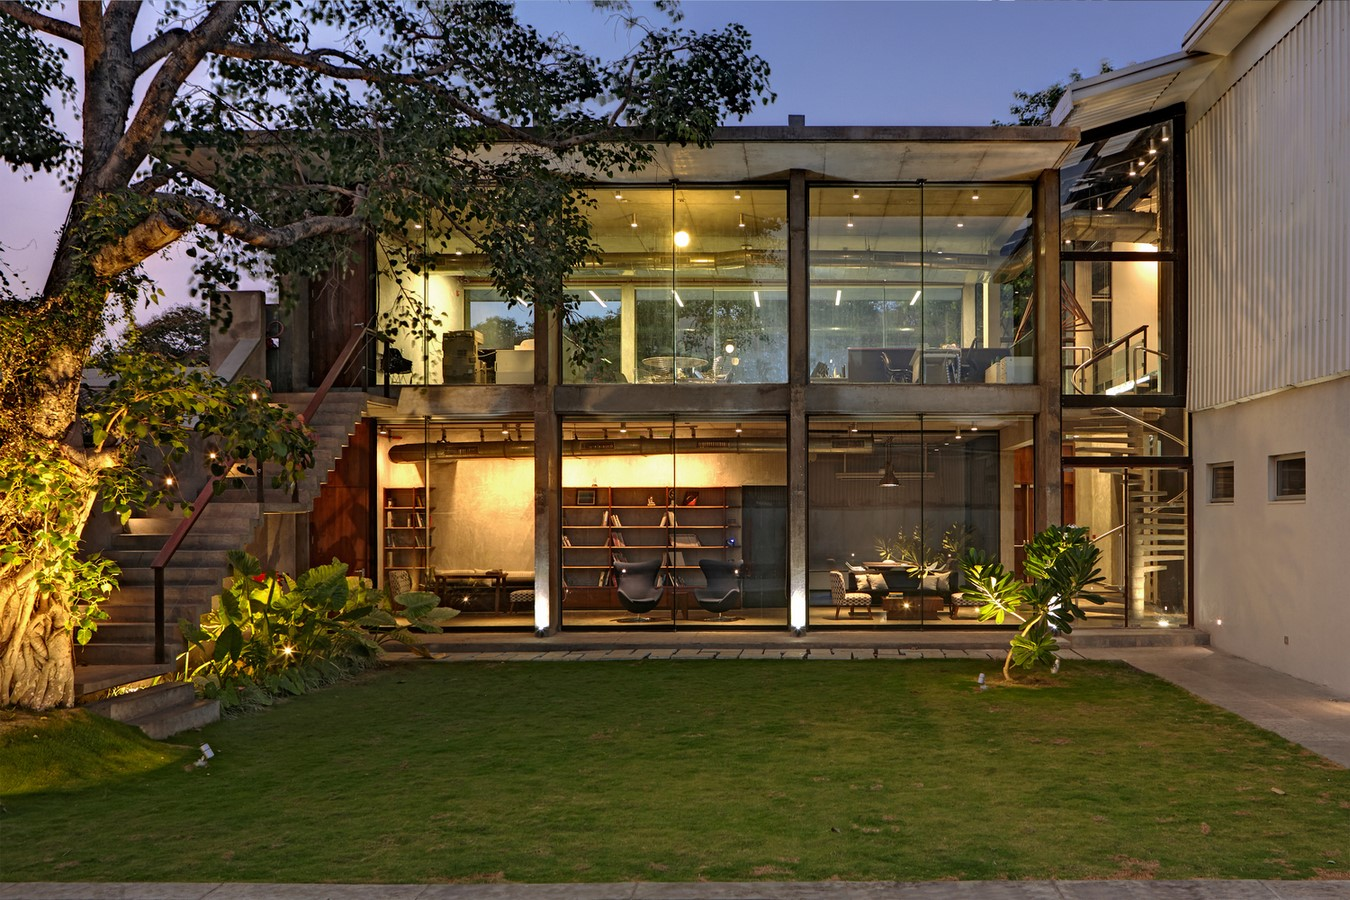 Mahindra Automobile Design Studio by Shimul Javeri Kadri: The styling studio - Sheet2